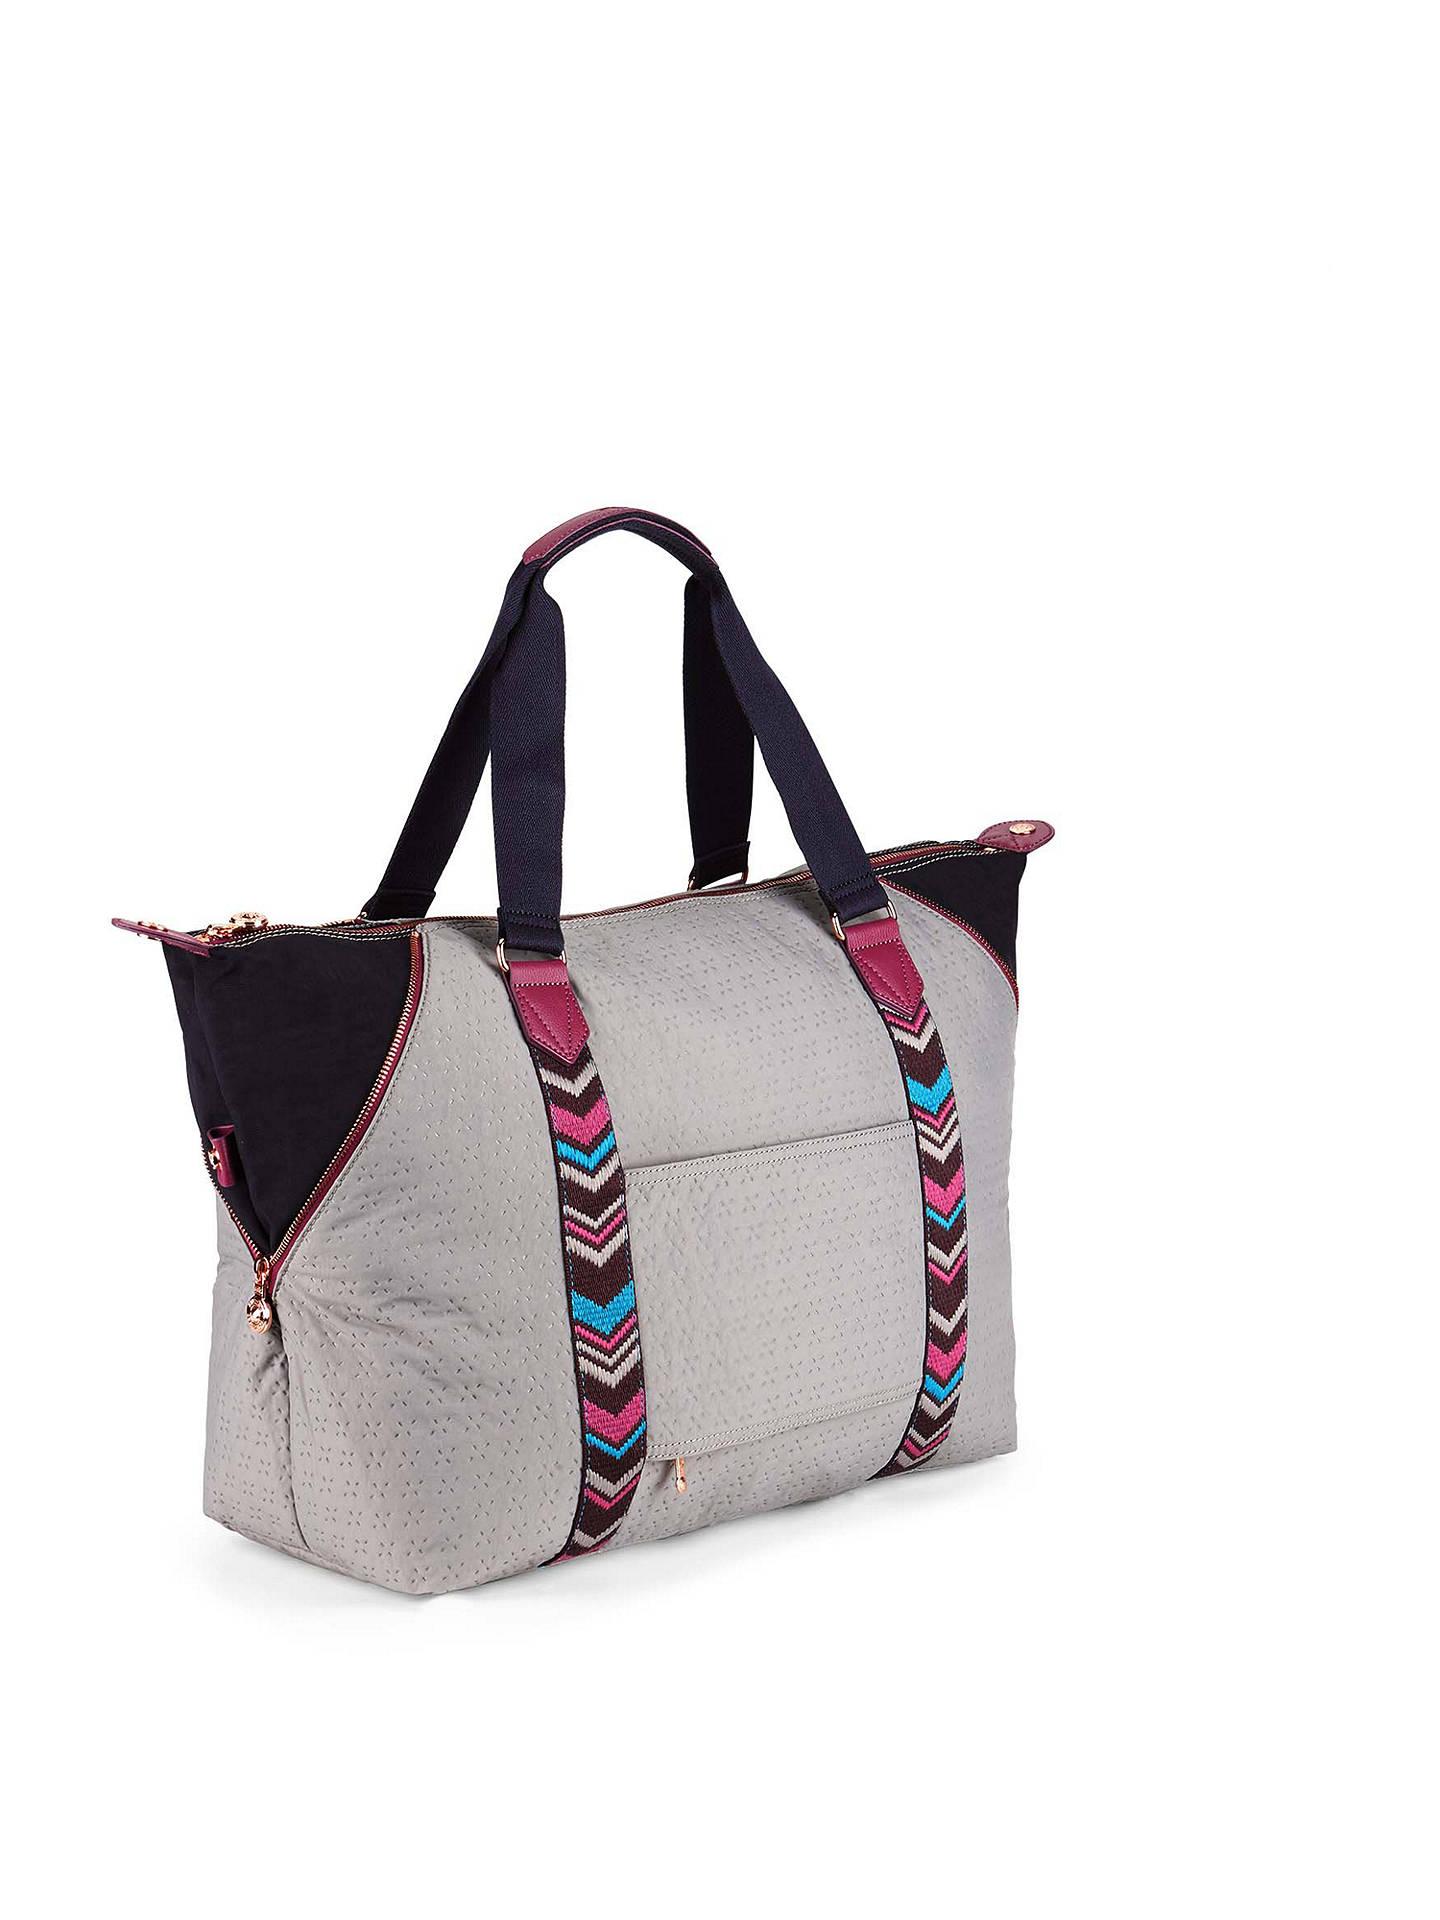 e2bbac09e4 ... Buy Kipling Art M Travel Tote Bag, Grey/Multi Online at johnlewis.com  ...